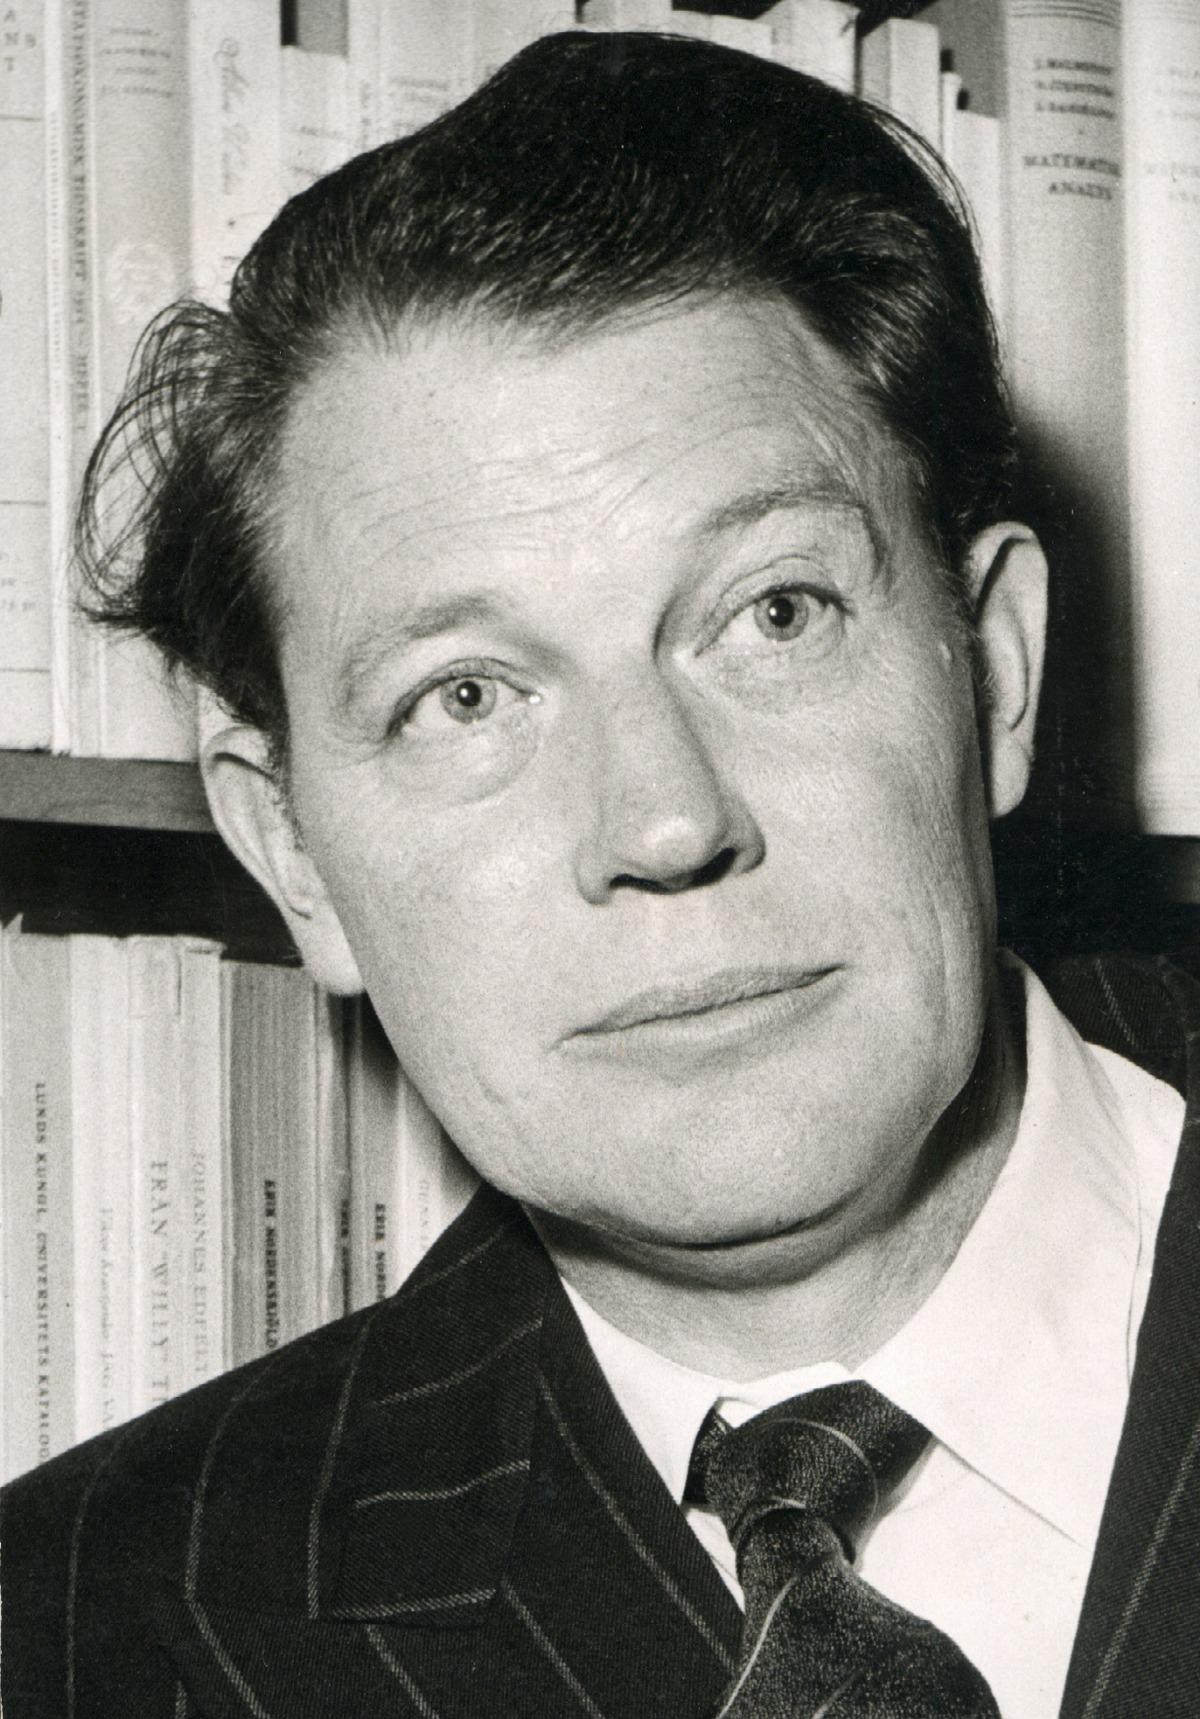 Ulf nilsson far litteraturpris